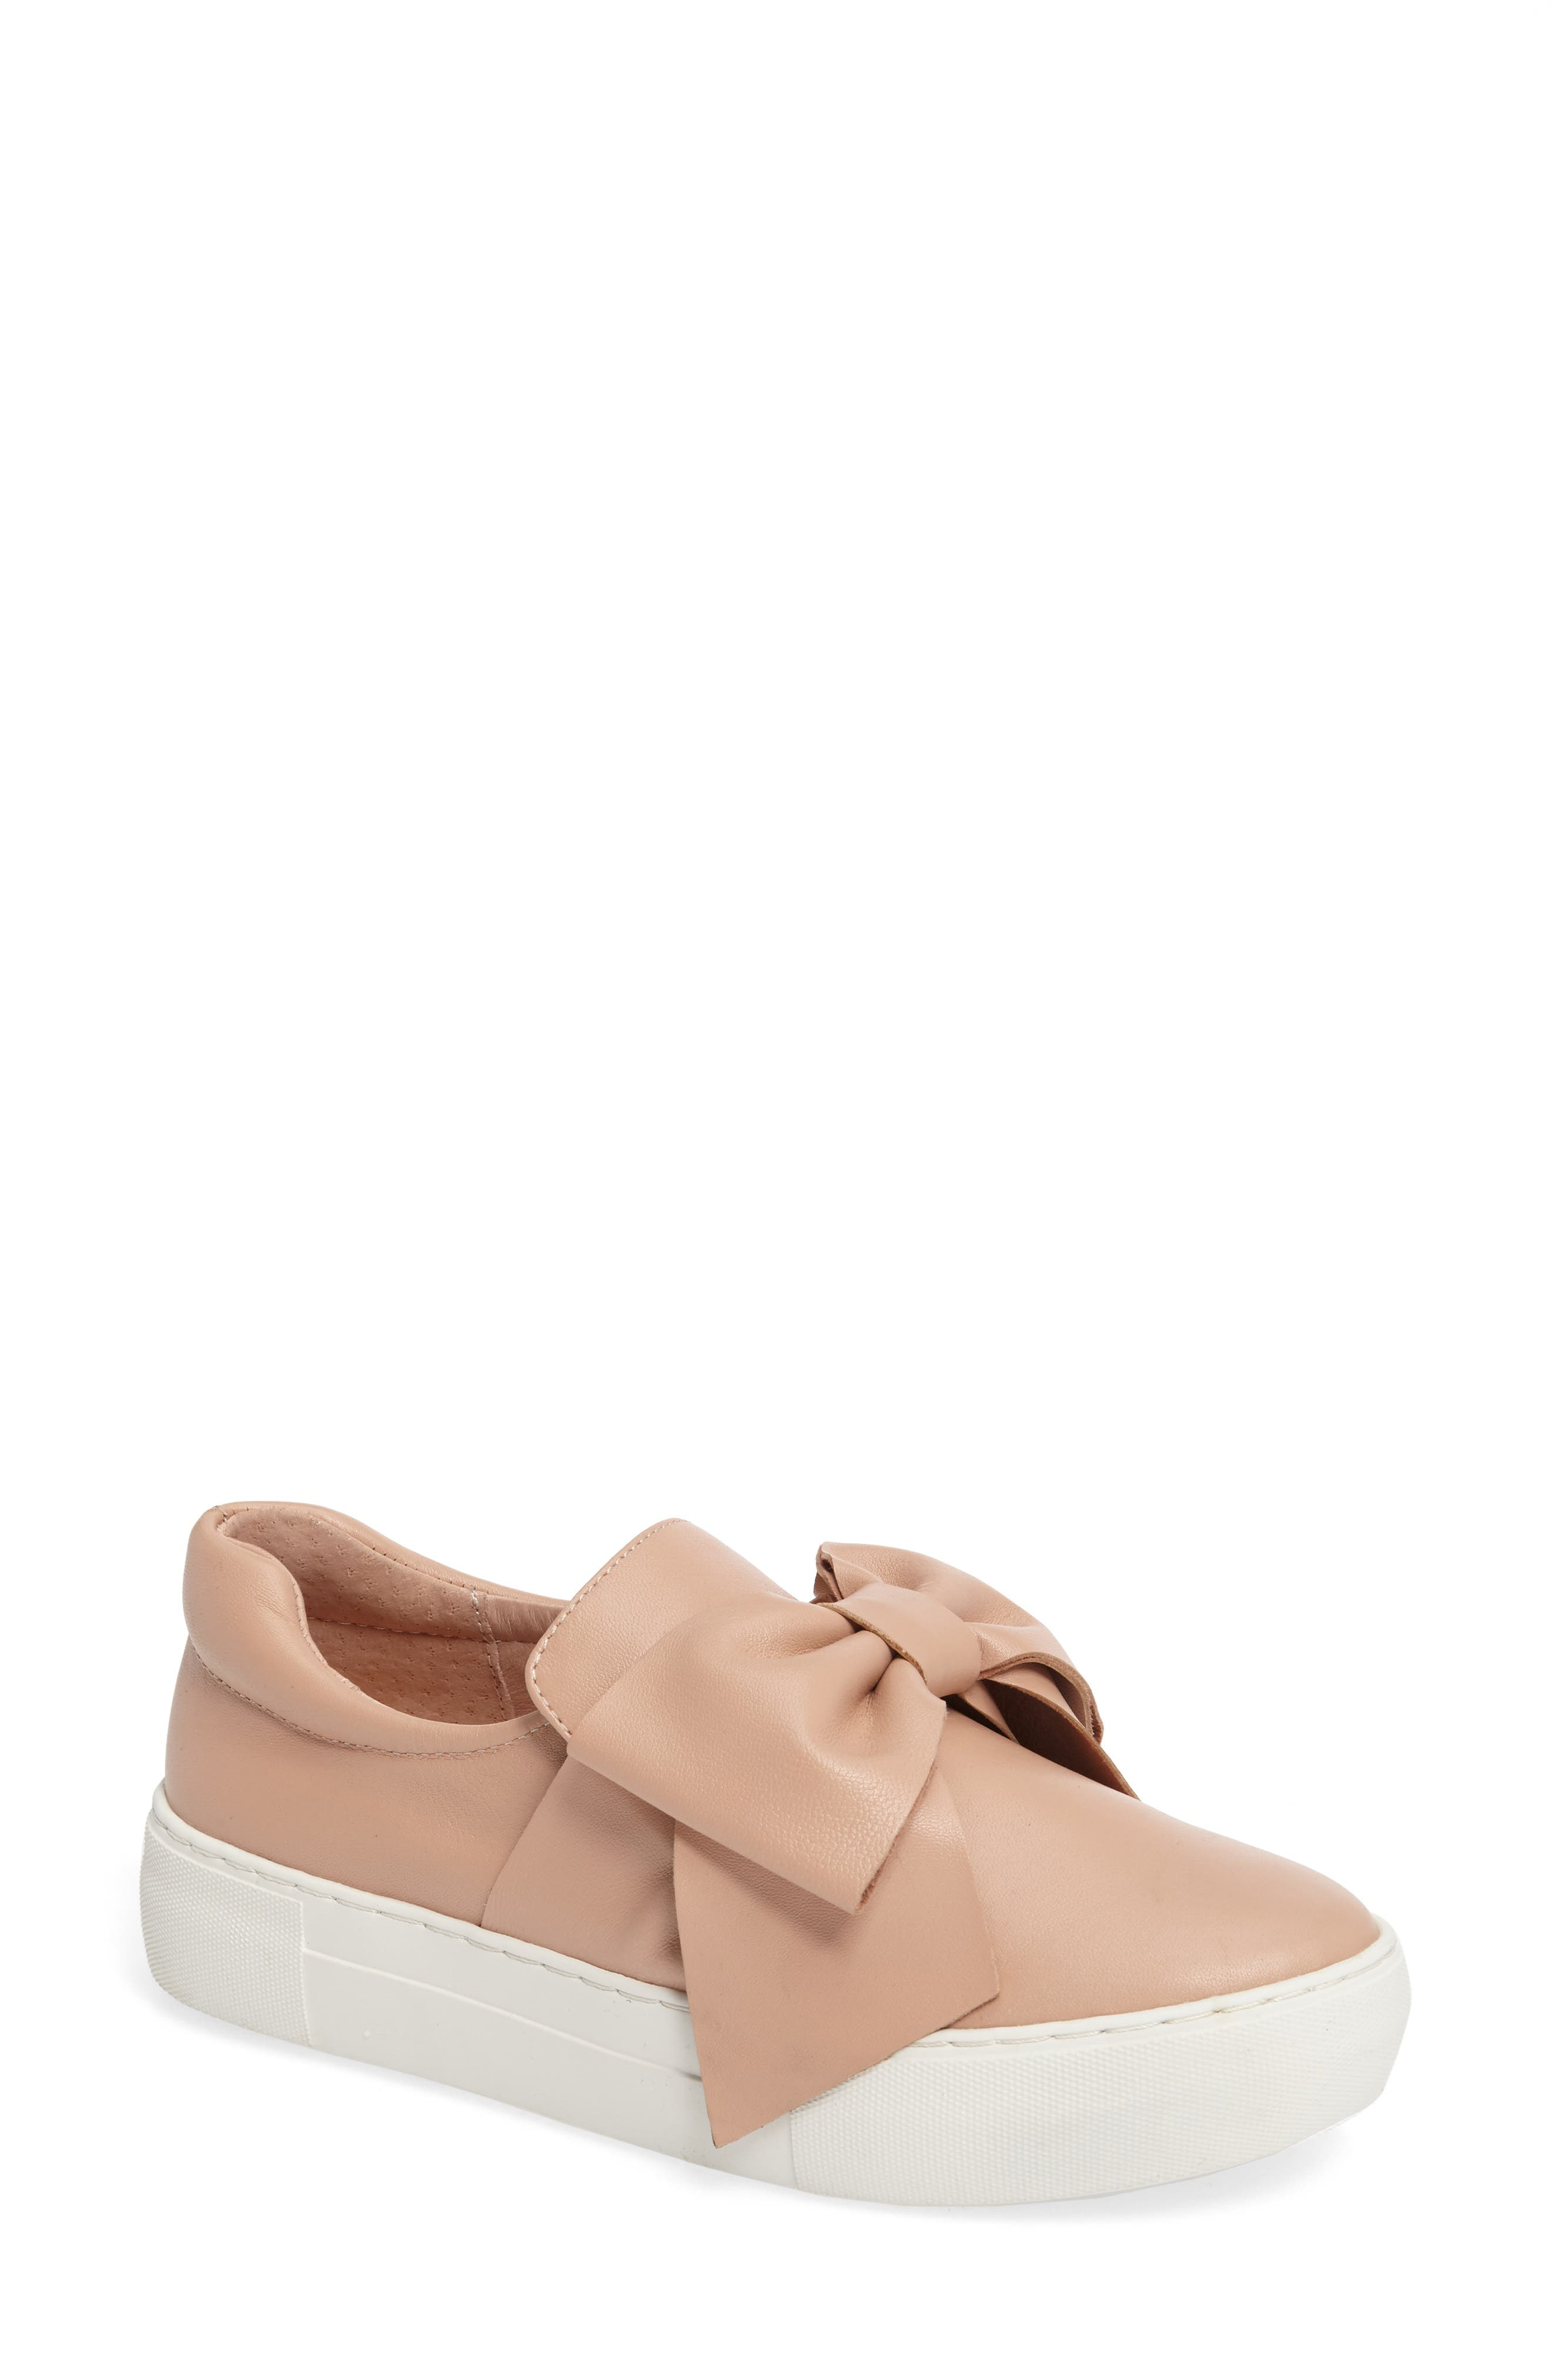 Main Image - JSlides Beauty Bow Platform Slip-On Sneaker (Women)